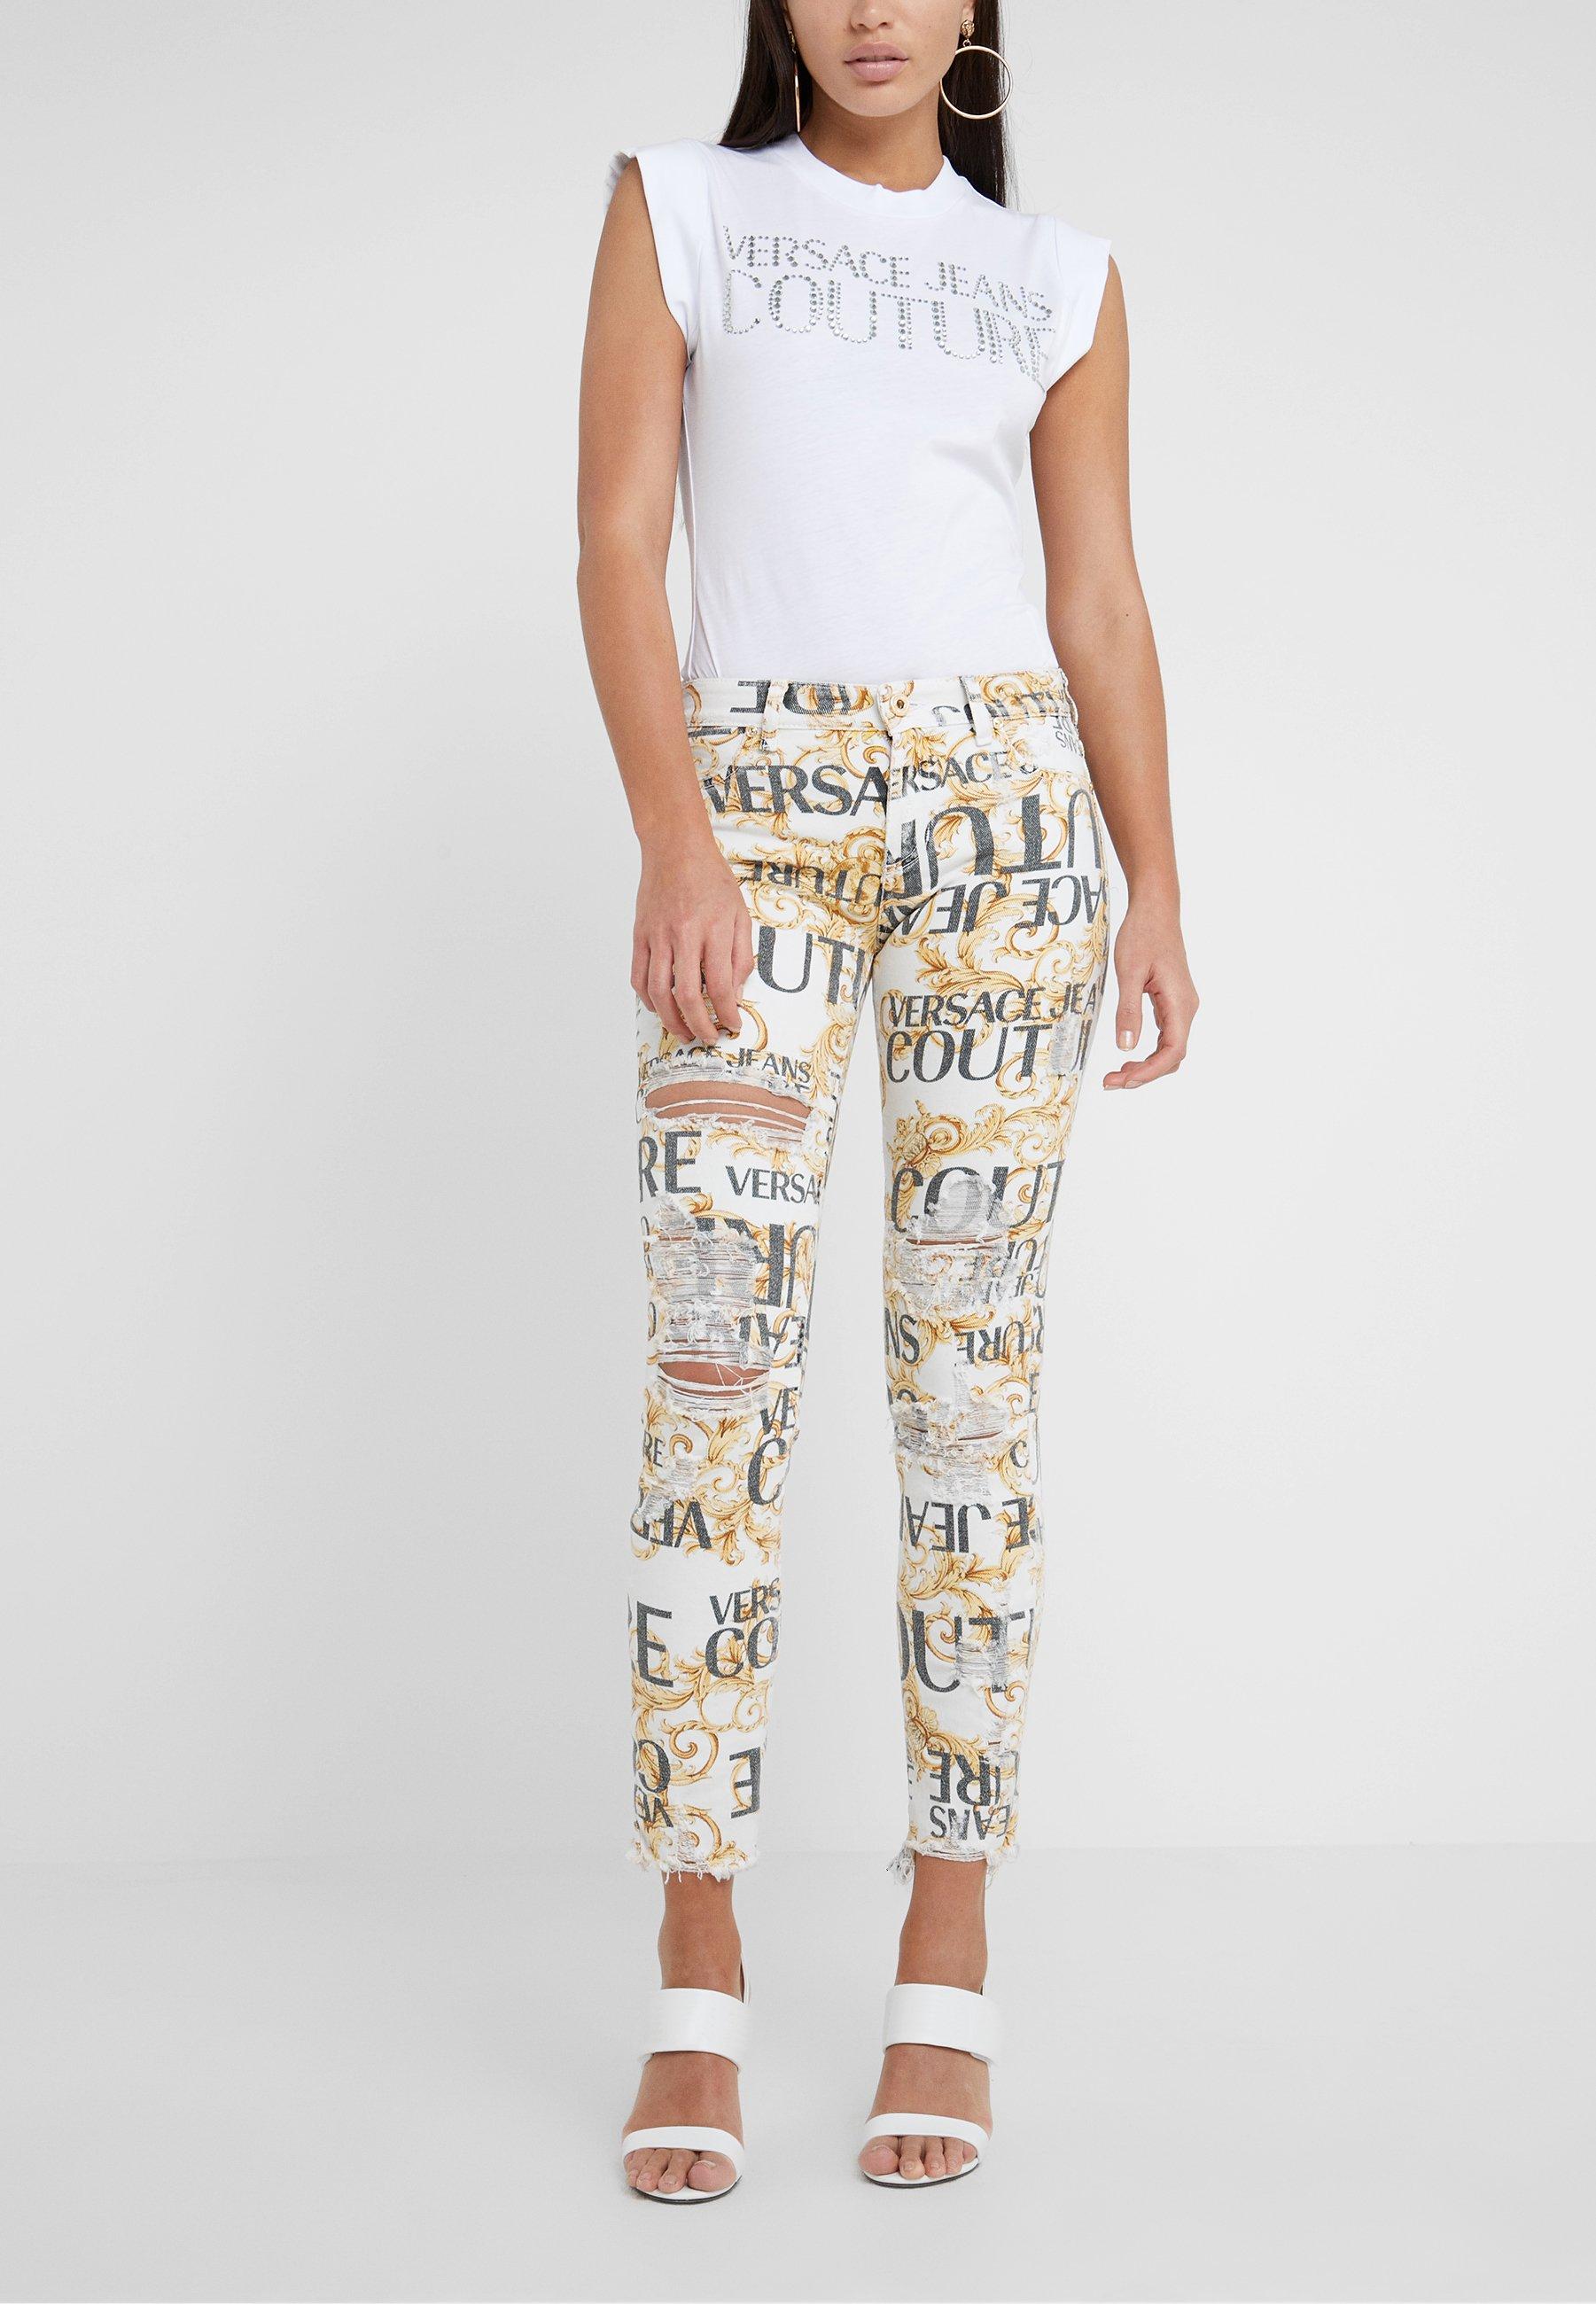 Versace Couture Versace Versace Jeans Jeans Jeans SkinnyWhite SkinnyWhite Couture EDY2IW9H